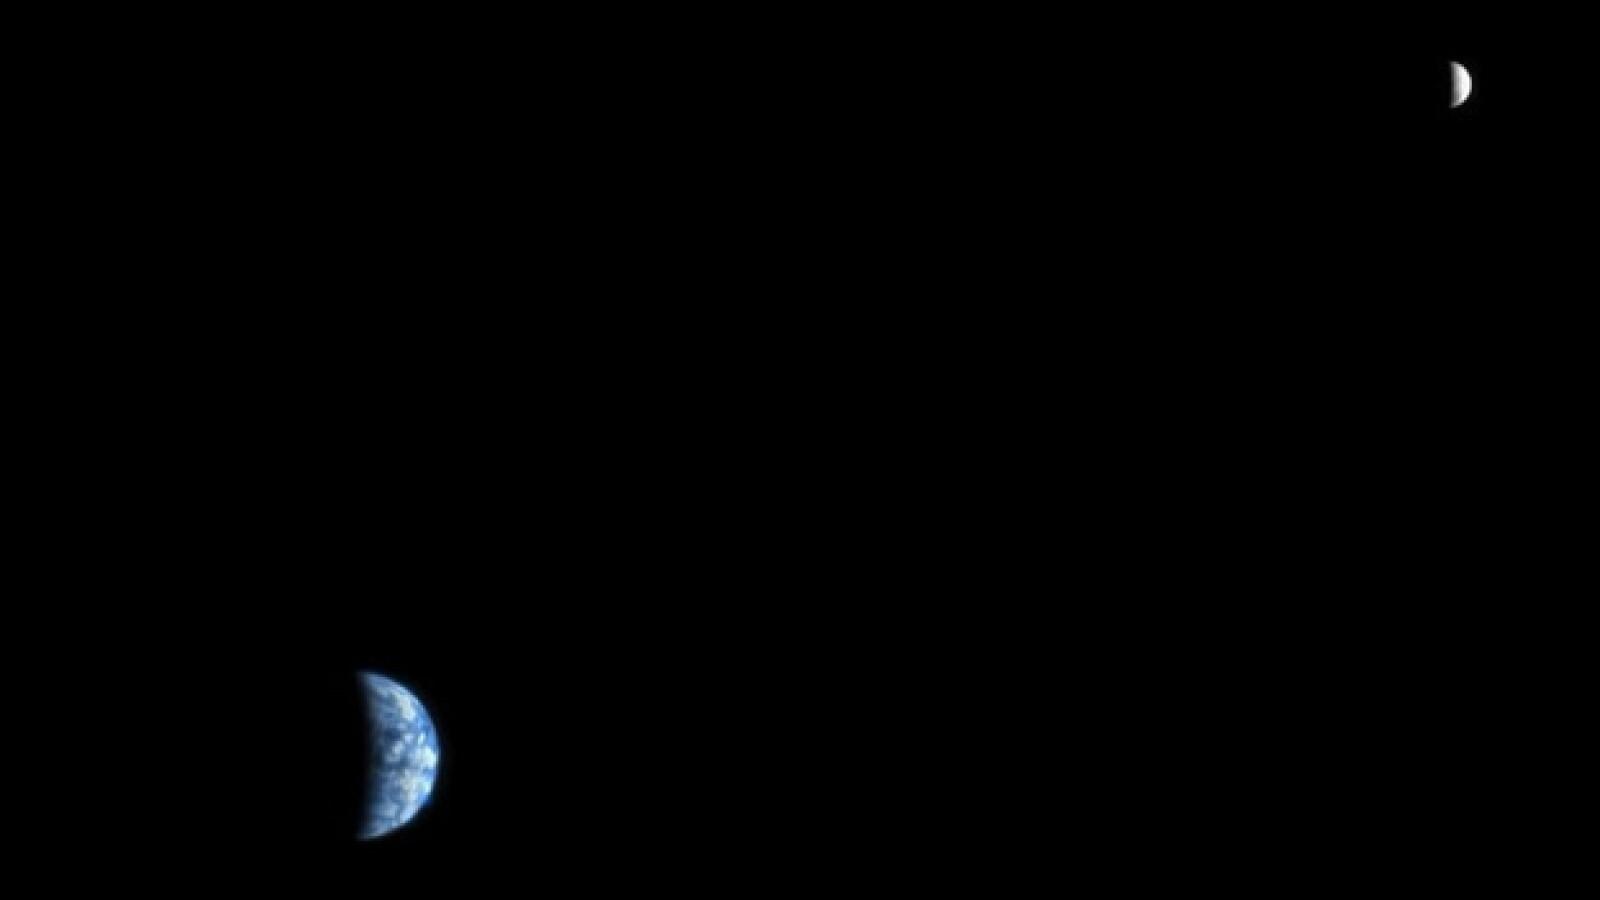 Marte, Mars Tierra Luna desde Mars Reconaissance Orbiter